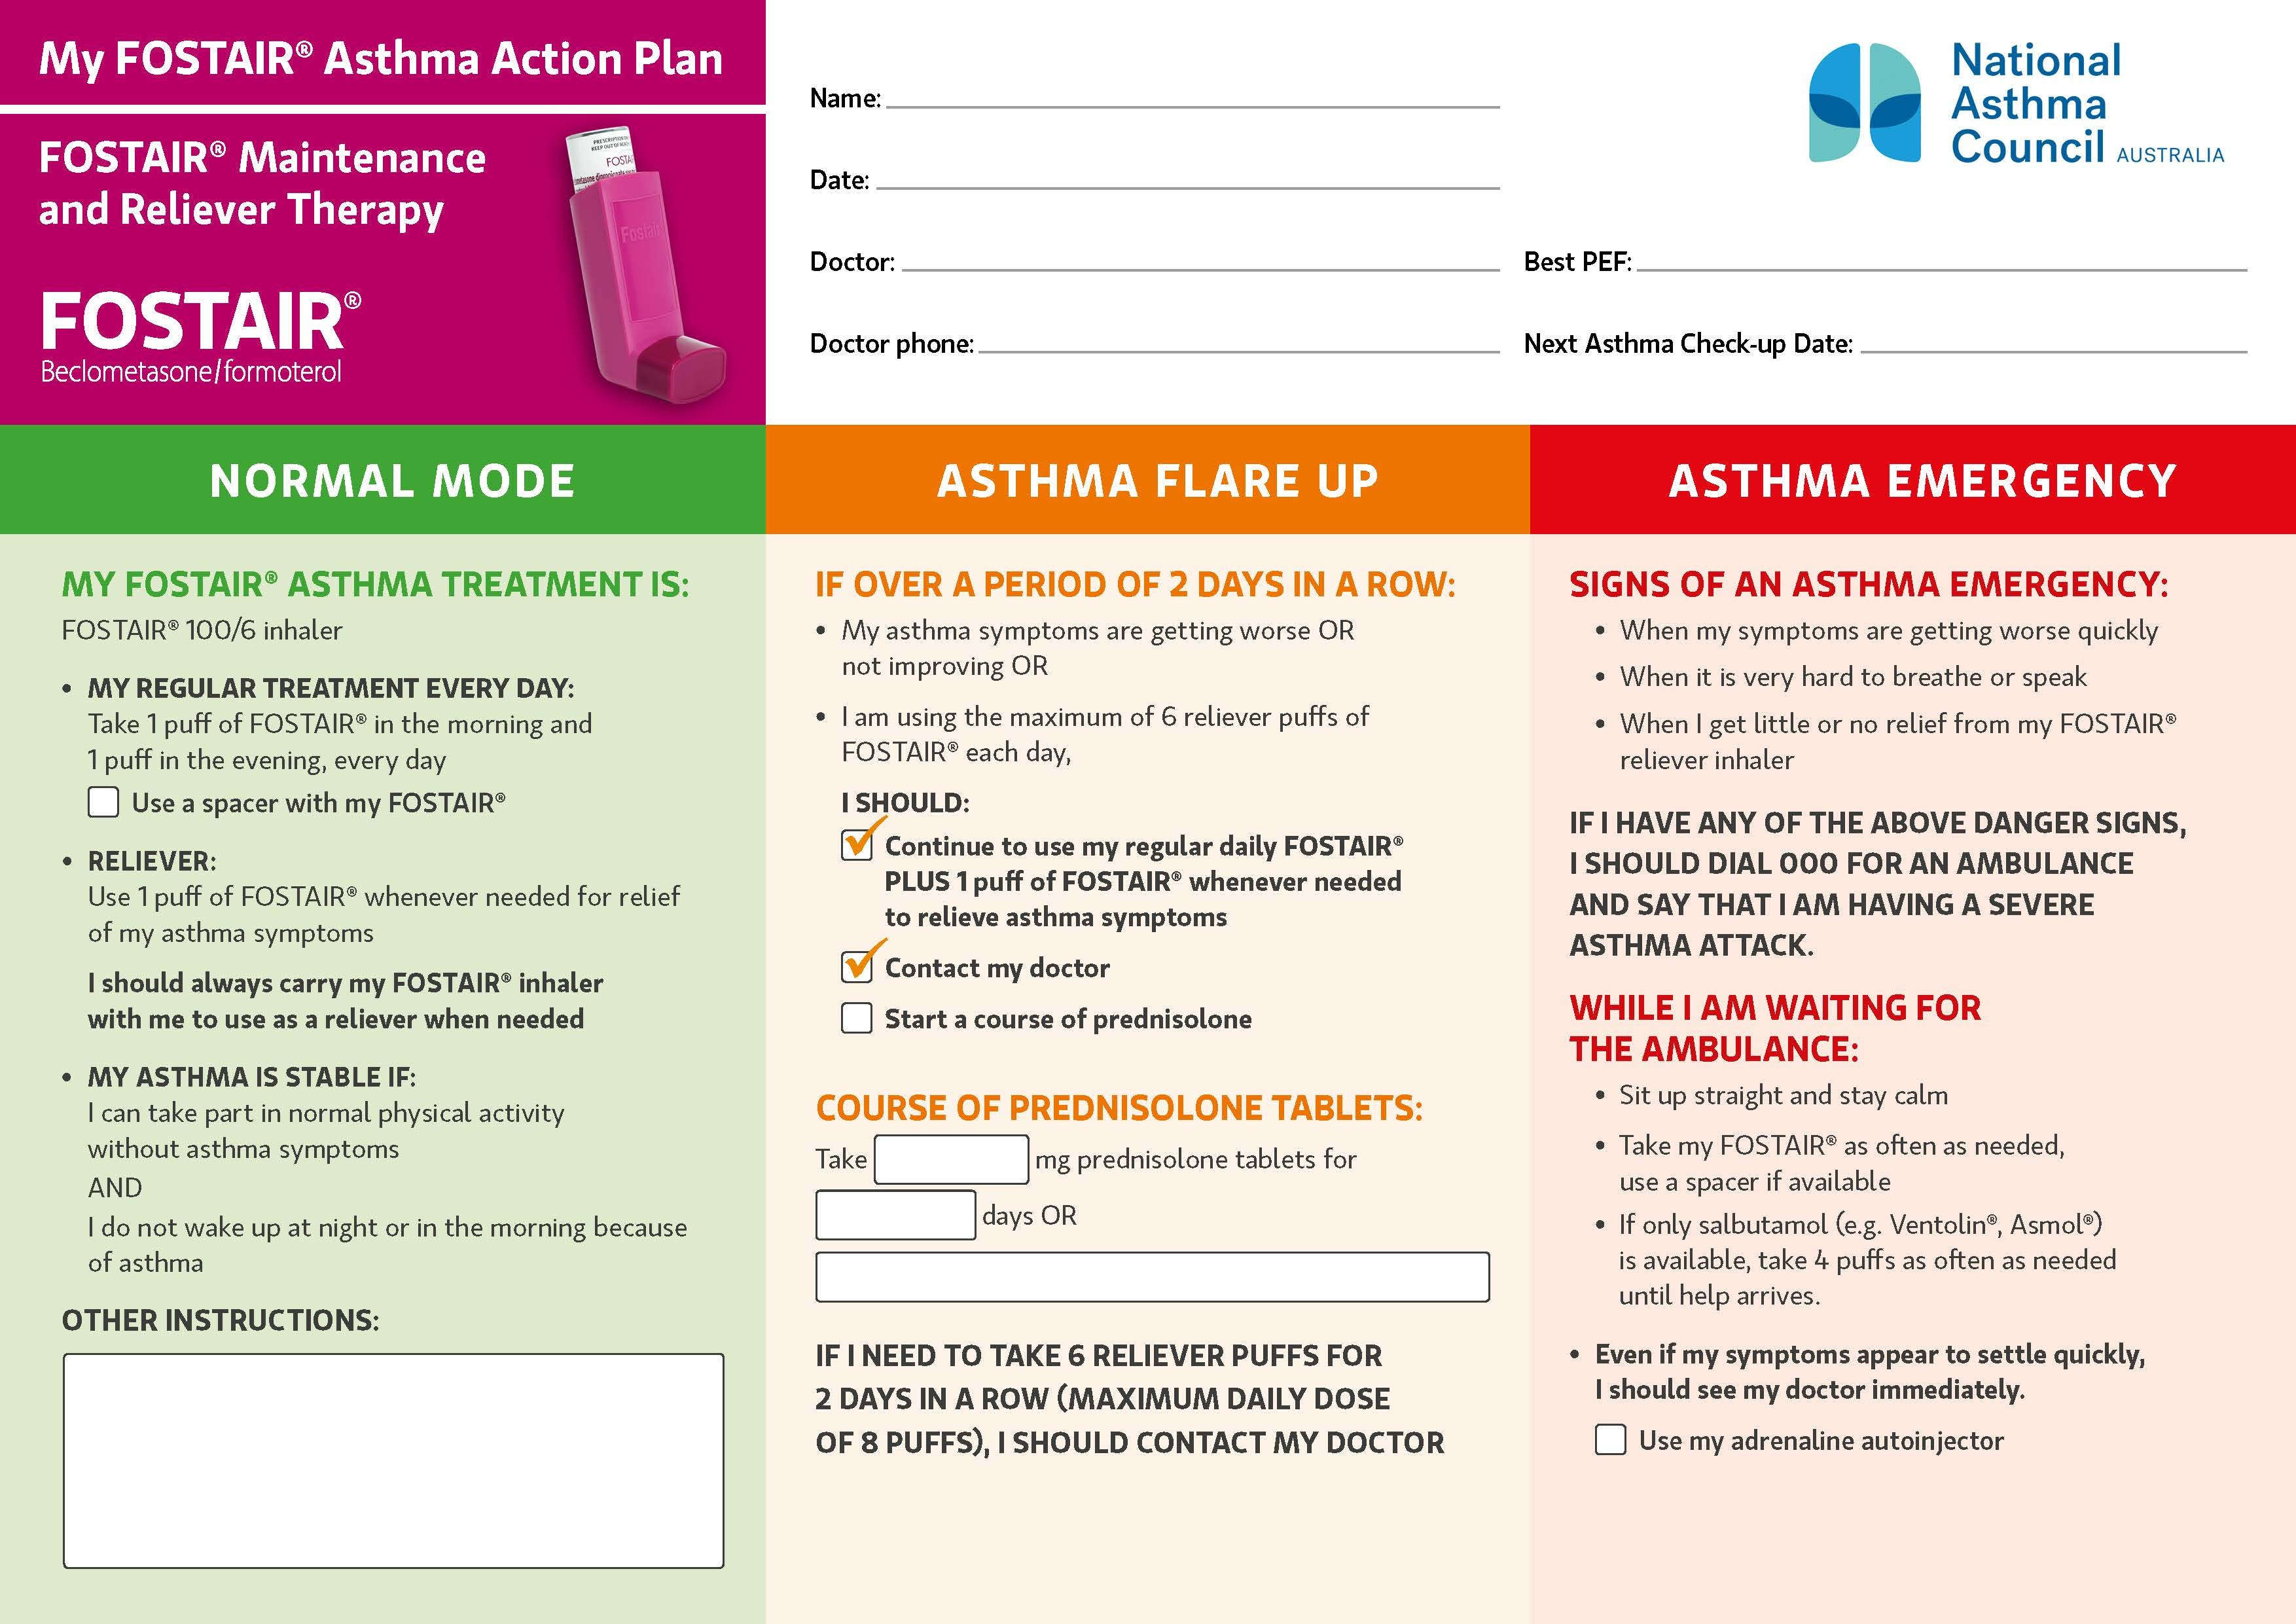 Fostair-Asthma-Action-Plan_Version2_Page_1.jpg#asset:2336